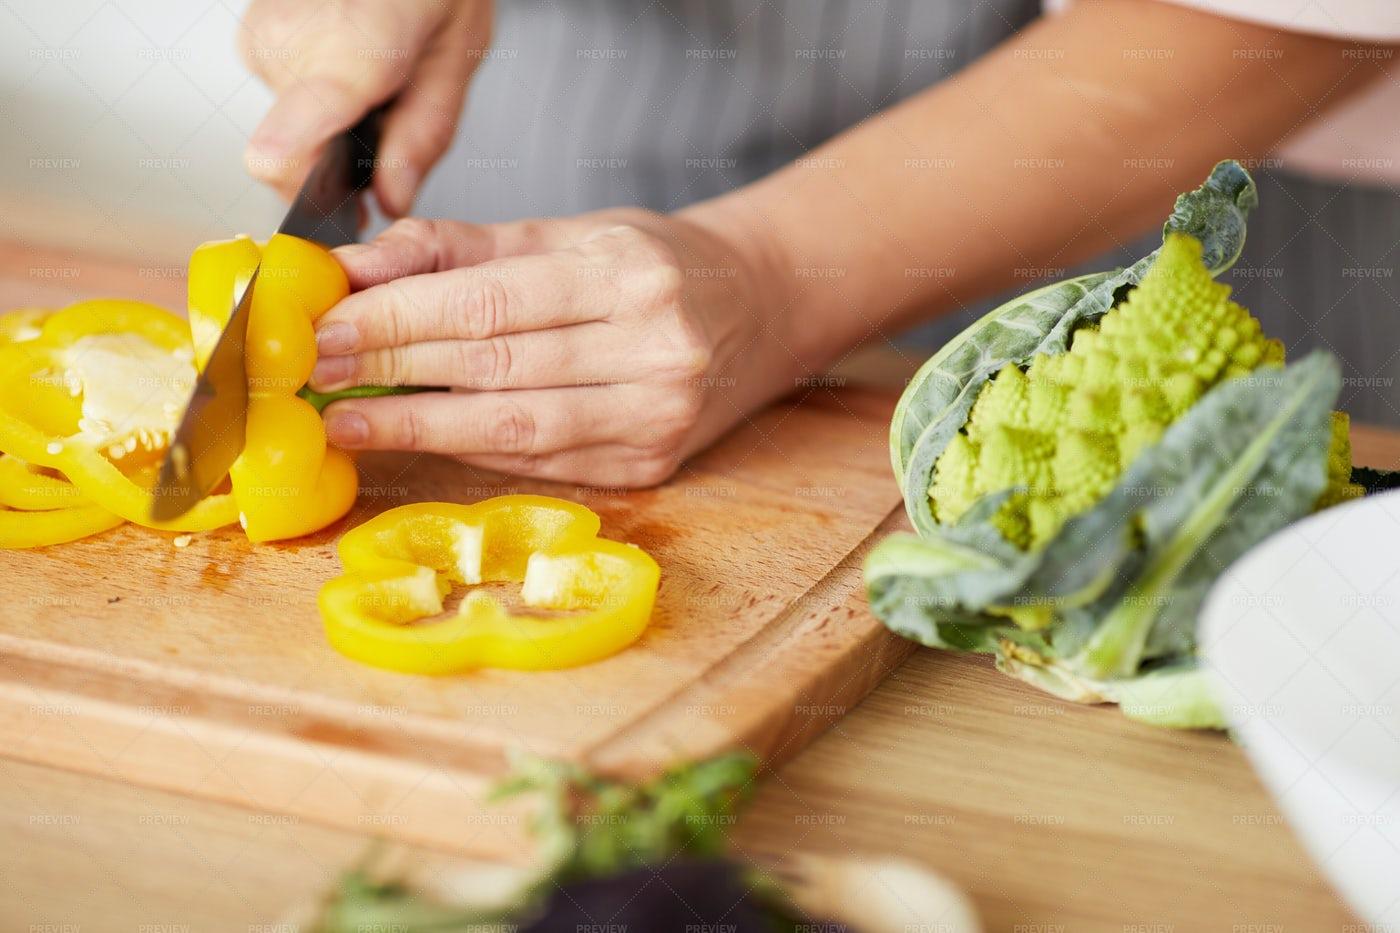 Woman Cutting Pepper: Stock Photos